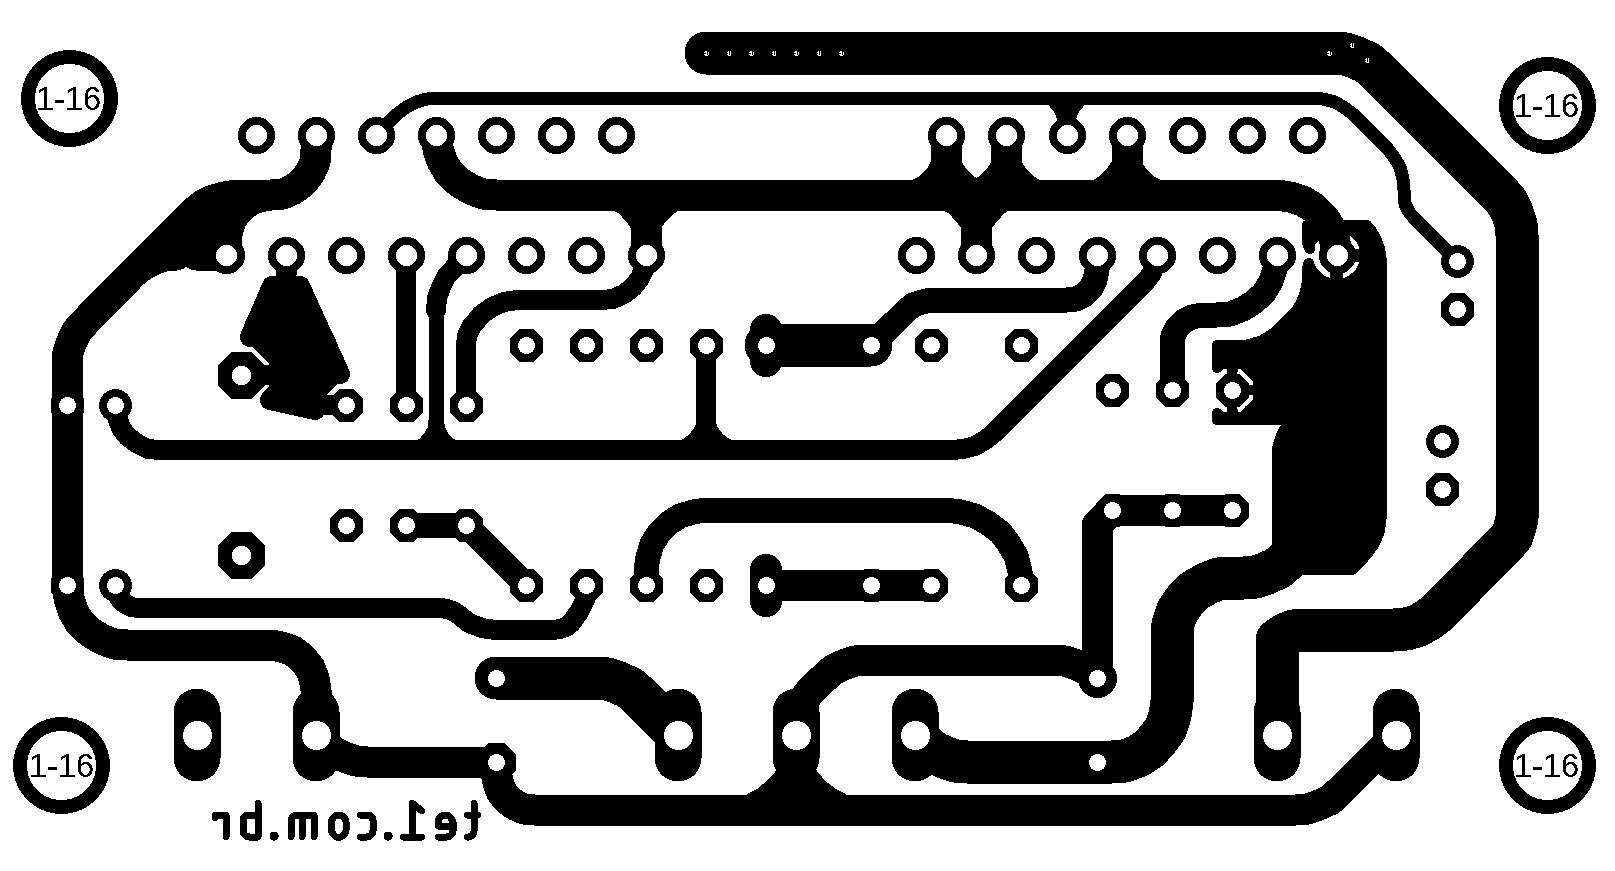 Audio Power Amplifier Modular Tda In Parallel Minimus